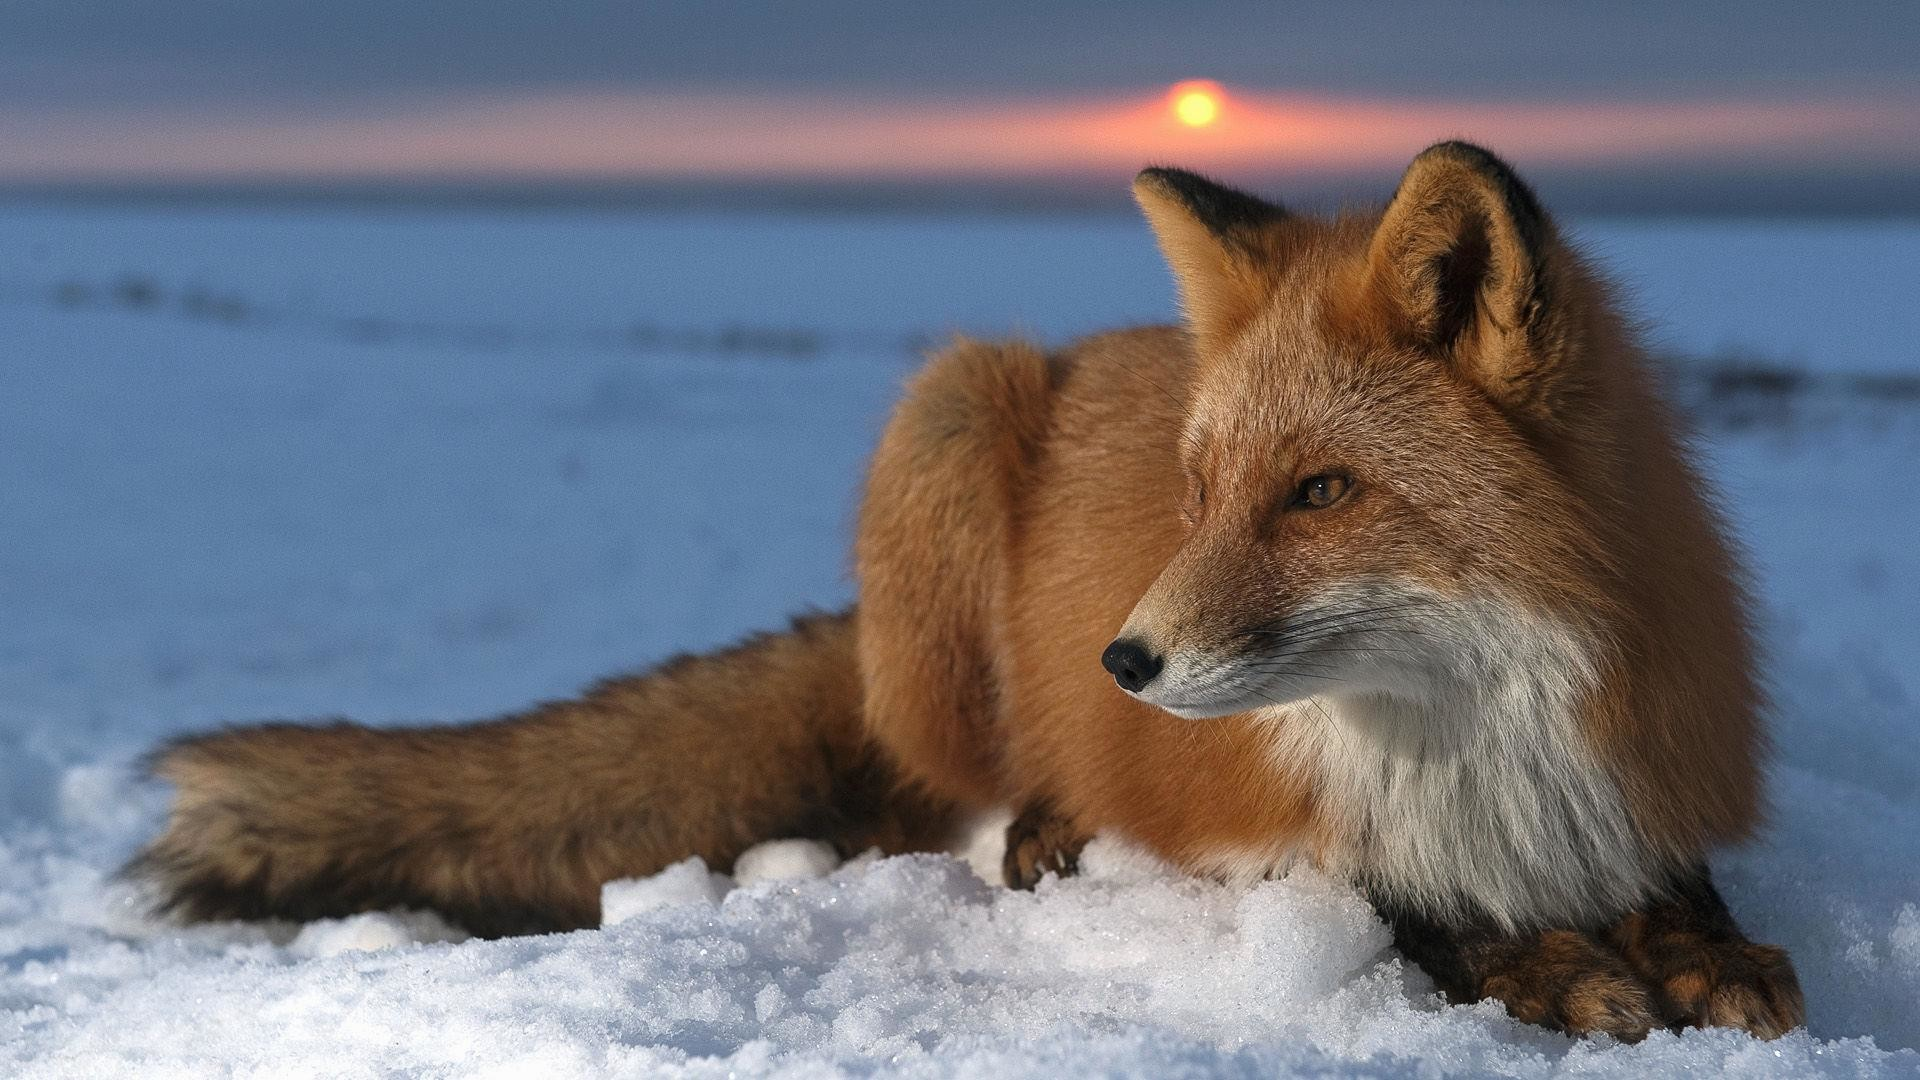 Wild-Animals-Wallpaper-HD-for-desktop